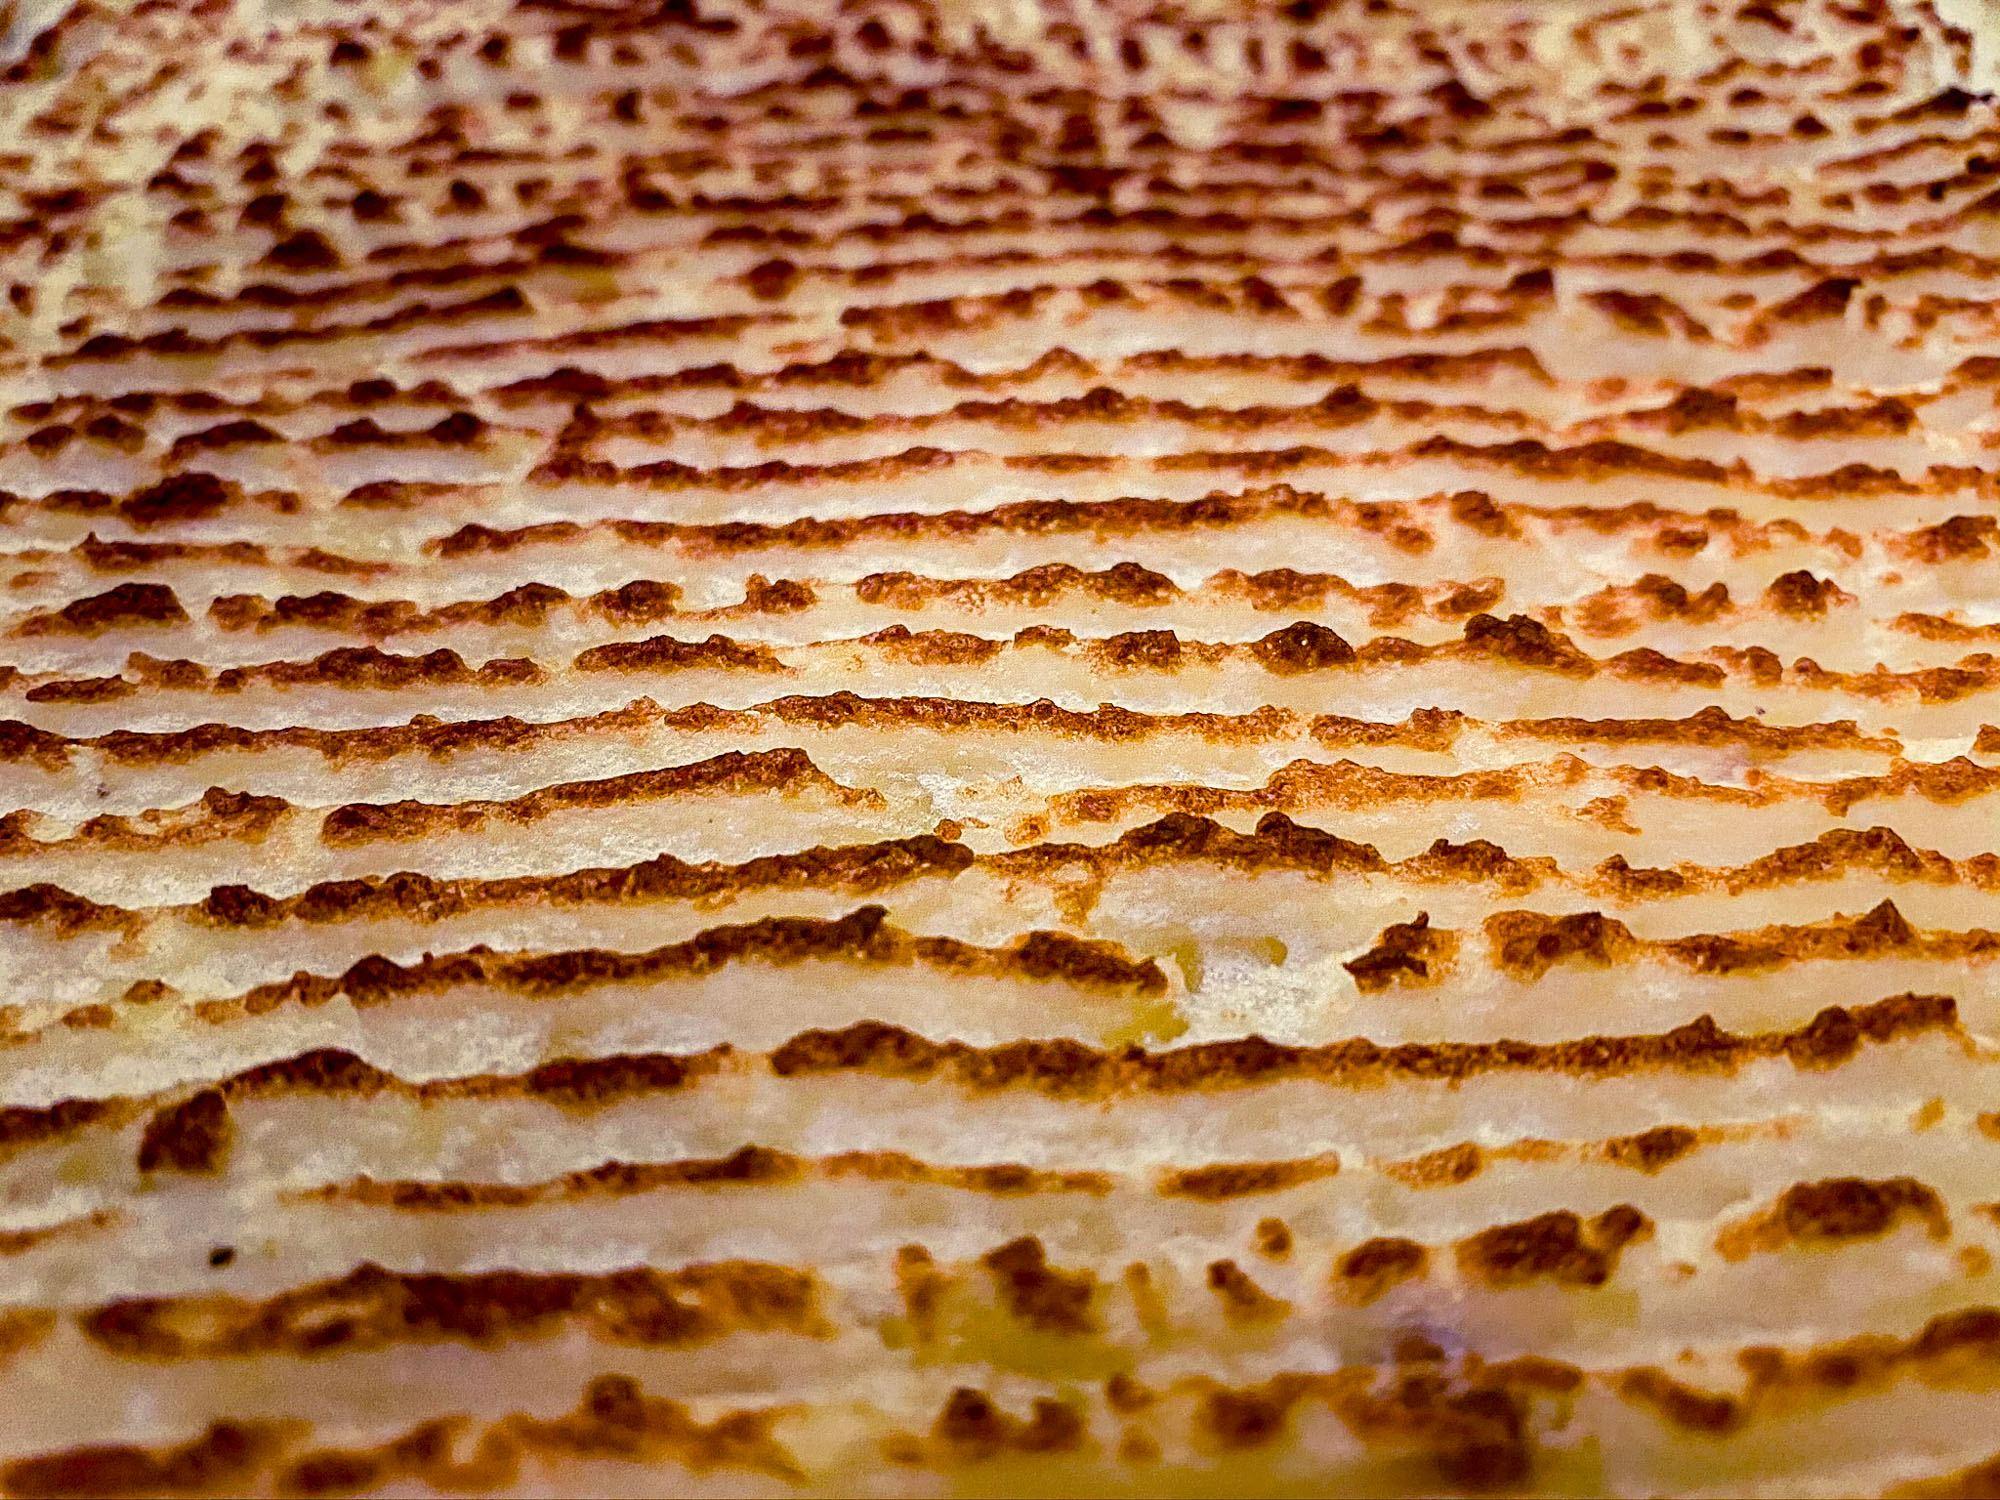 Martin Cregg - Food - Shepherd's Pie Mountains